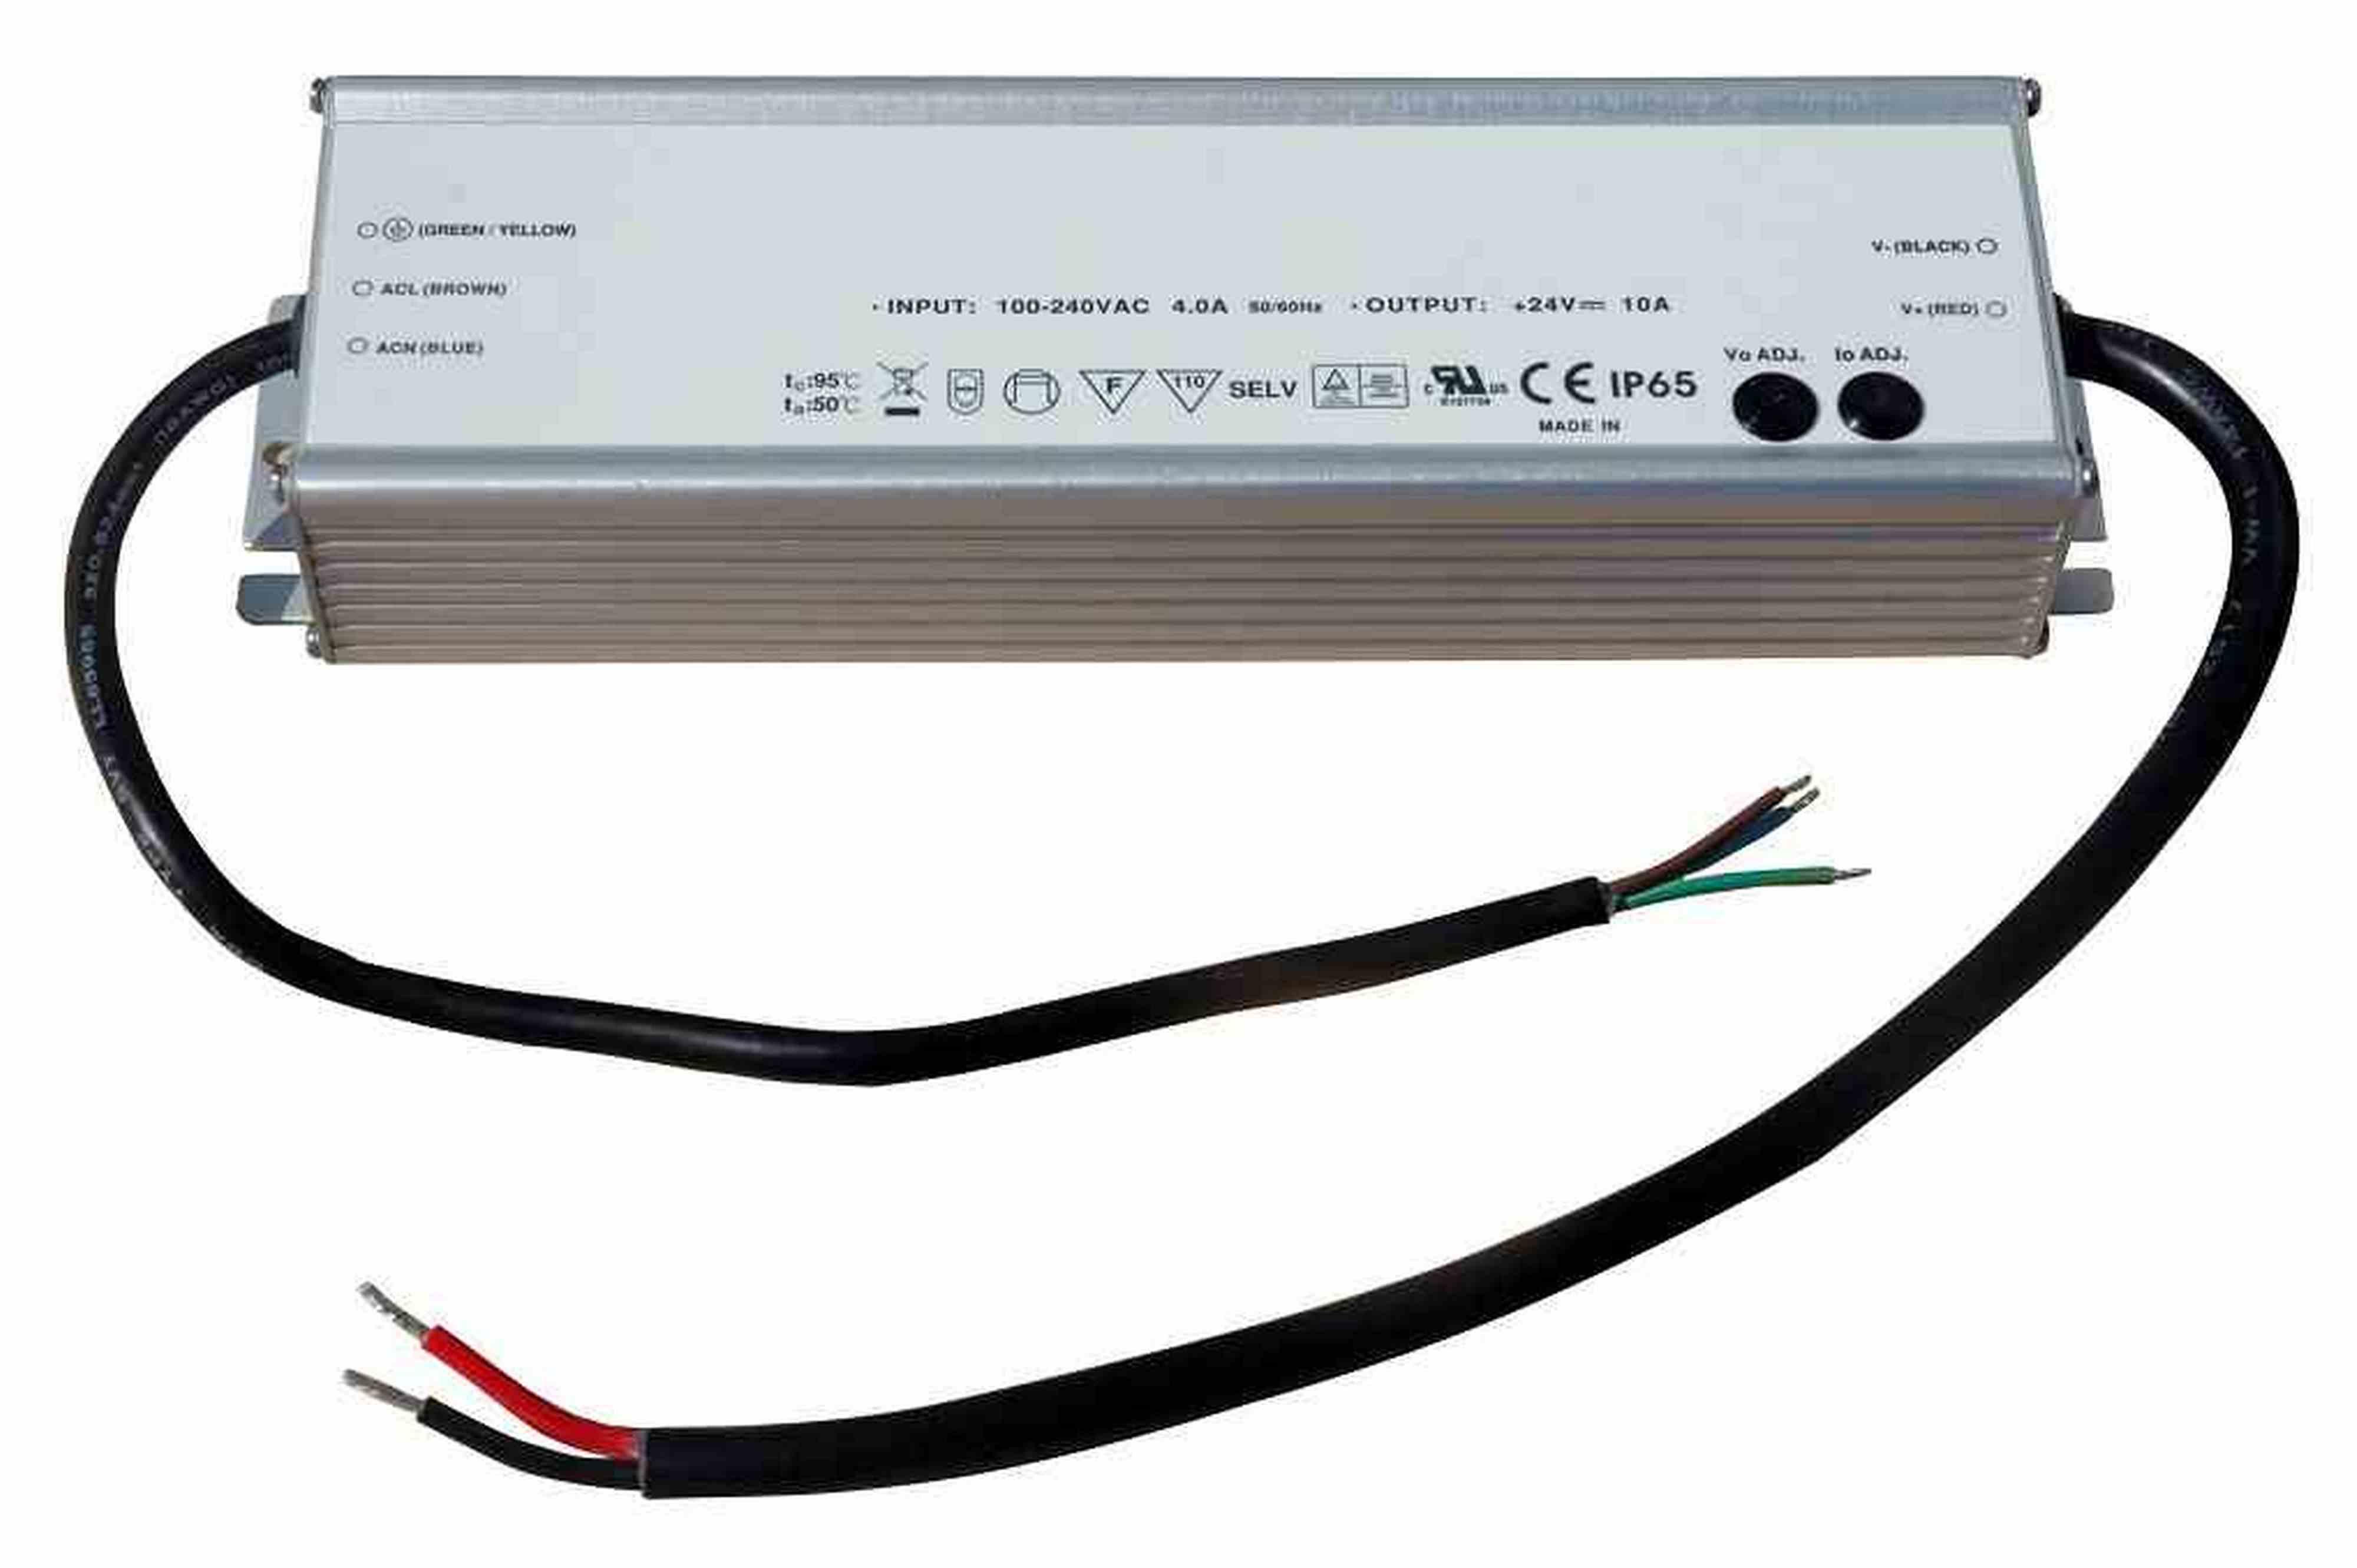 Replacement 480V Driver for GAU-48-160W-LED-V2-480V